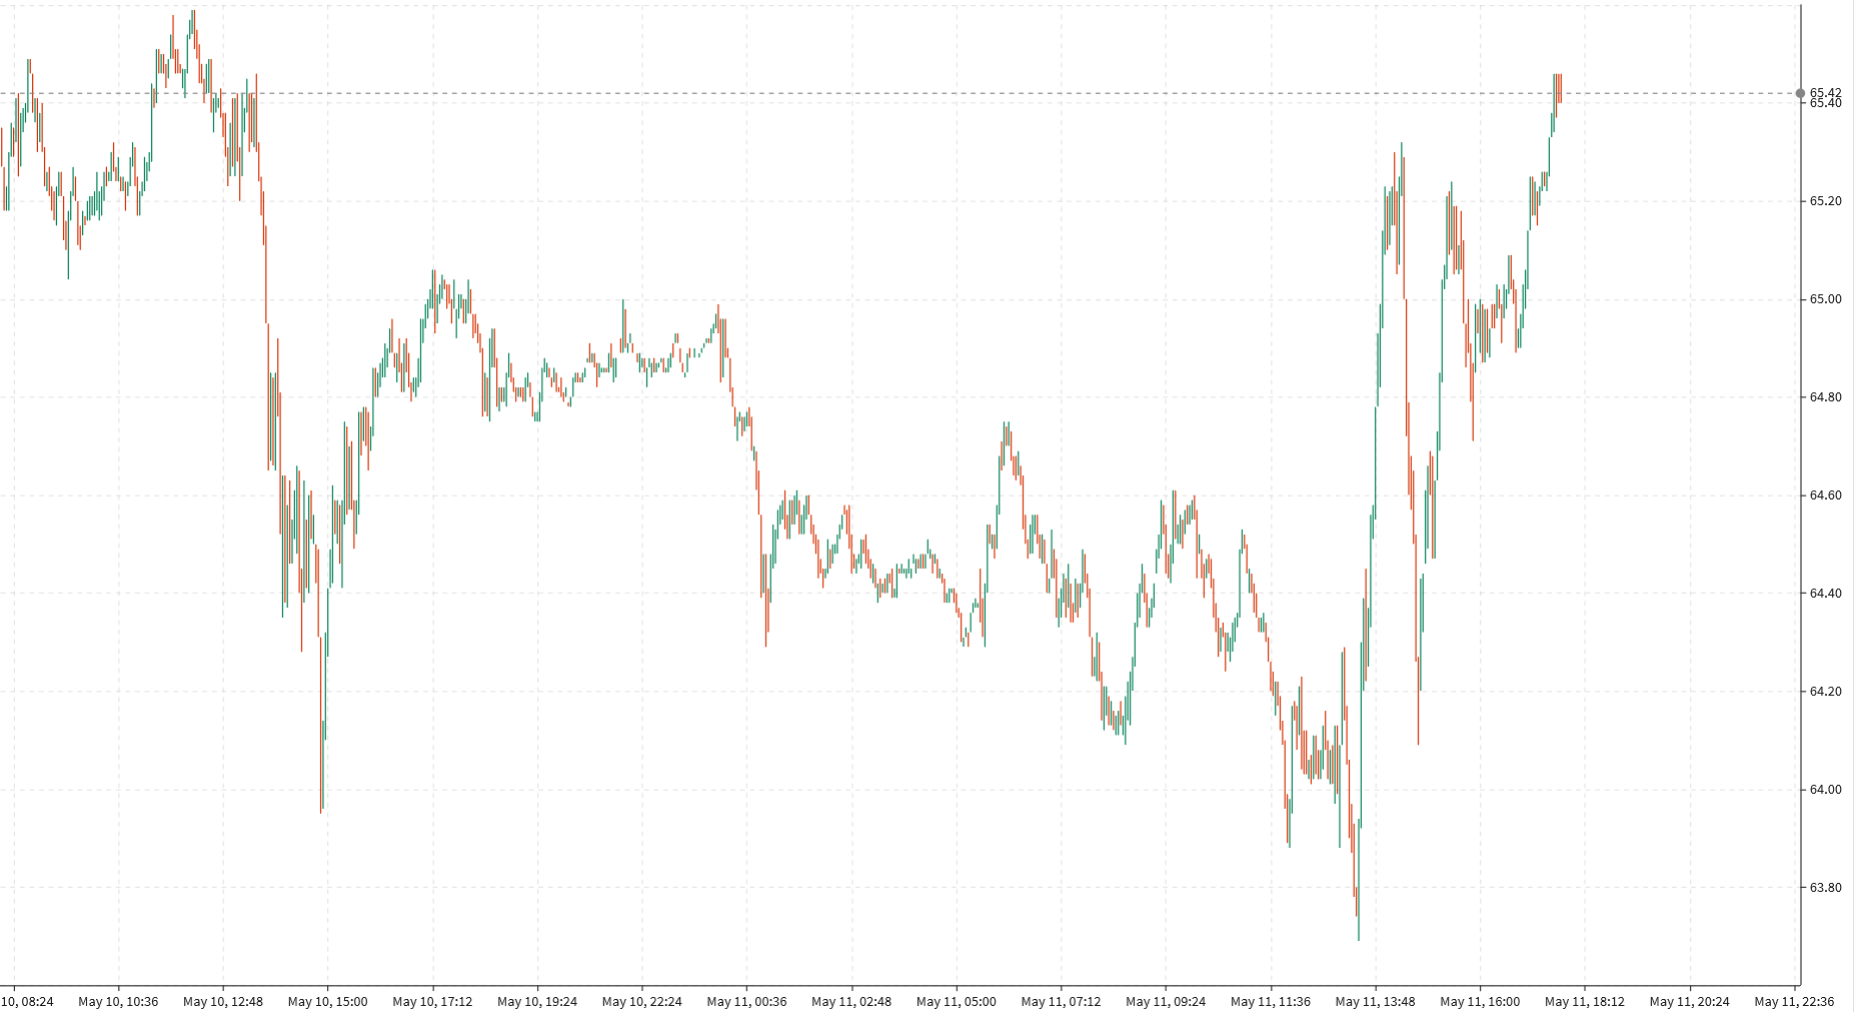 WTI crude climbs to $65.45